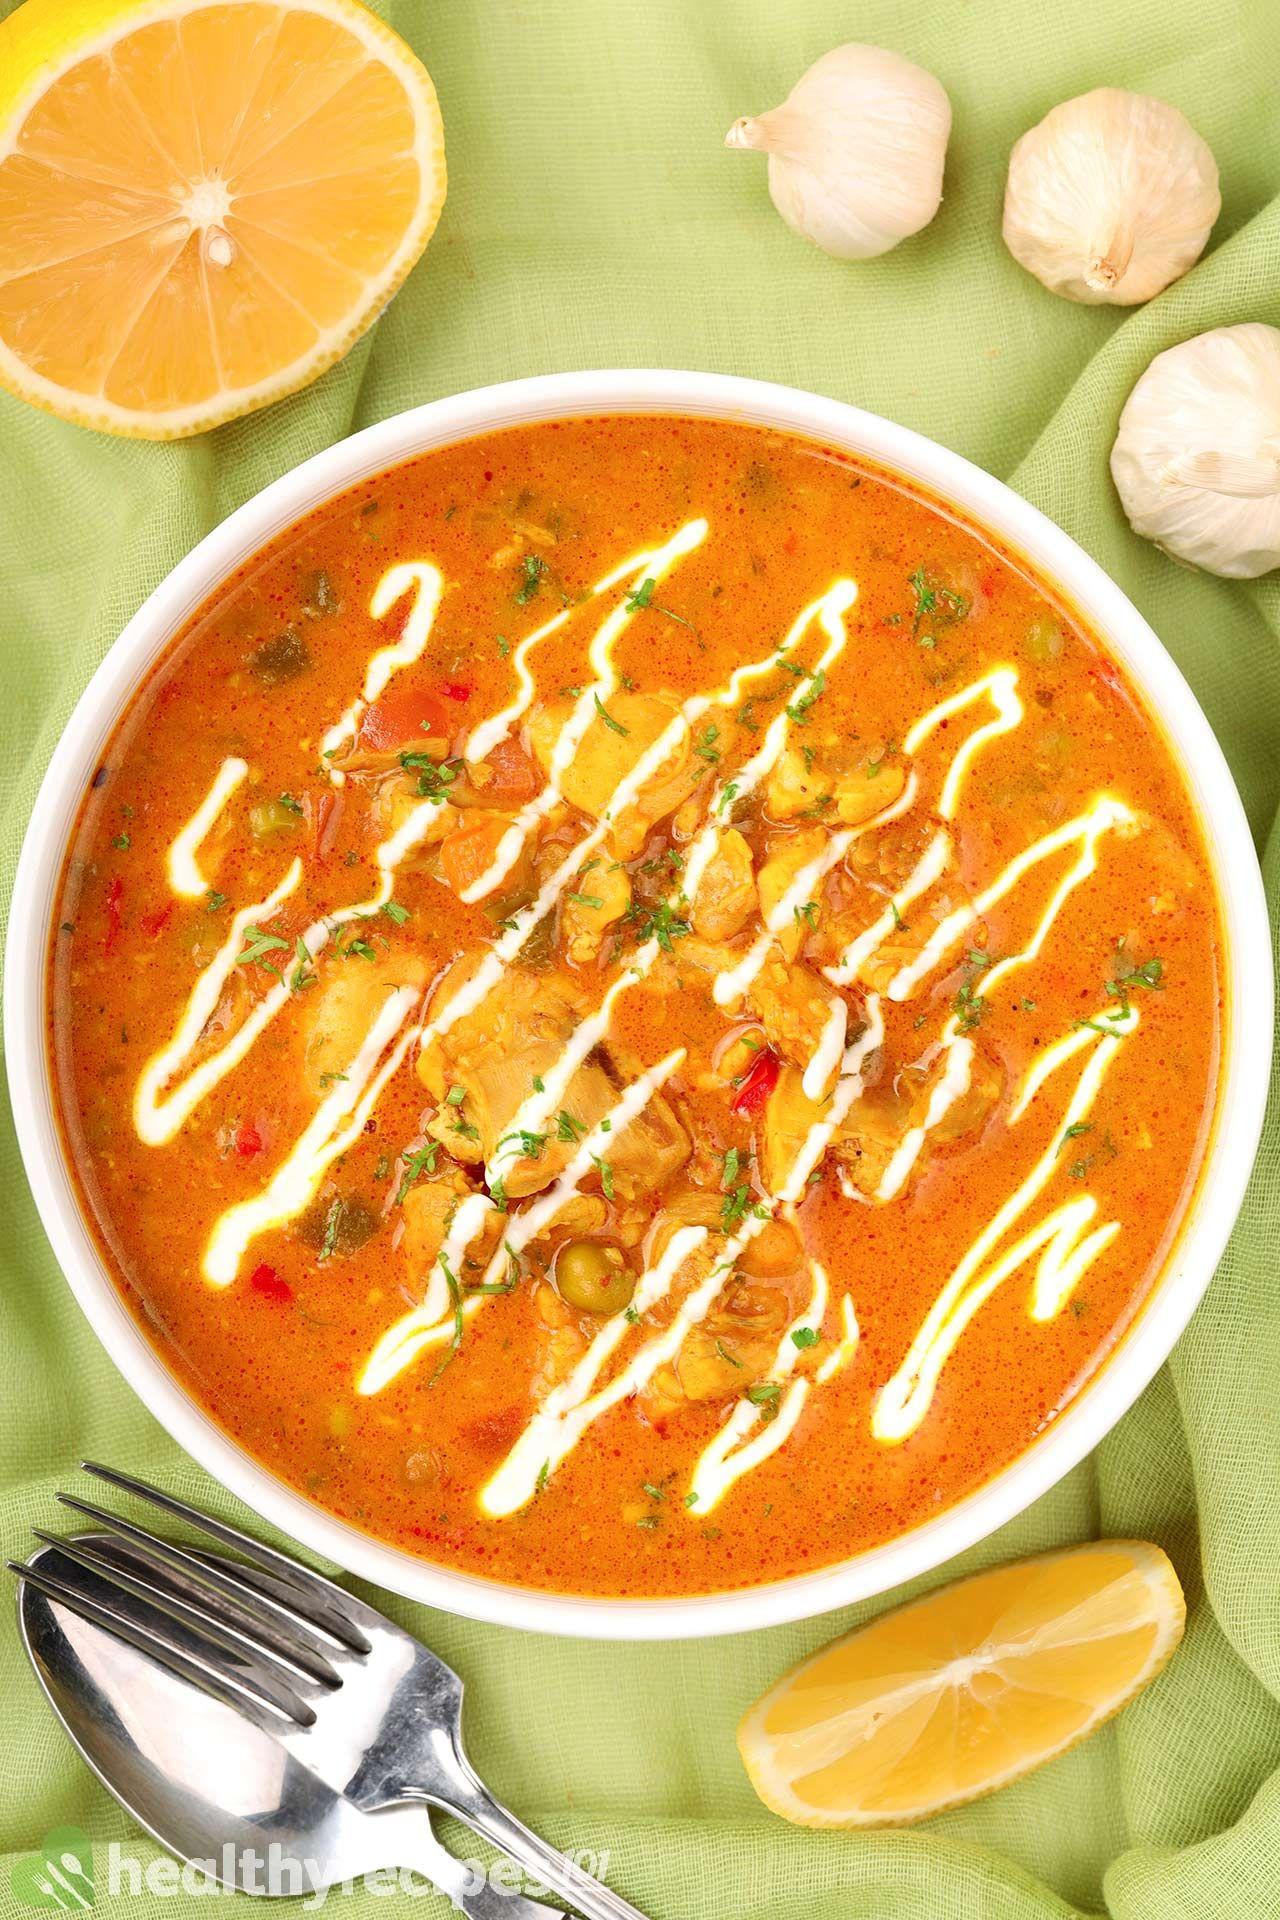 Tips for Perfect Chicken Tikka Masala